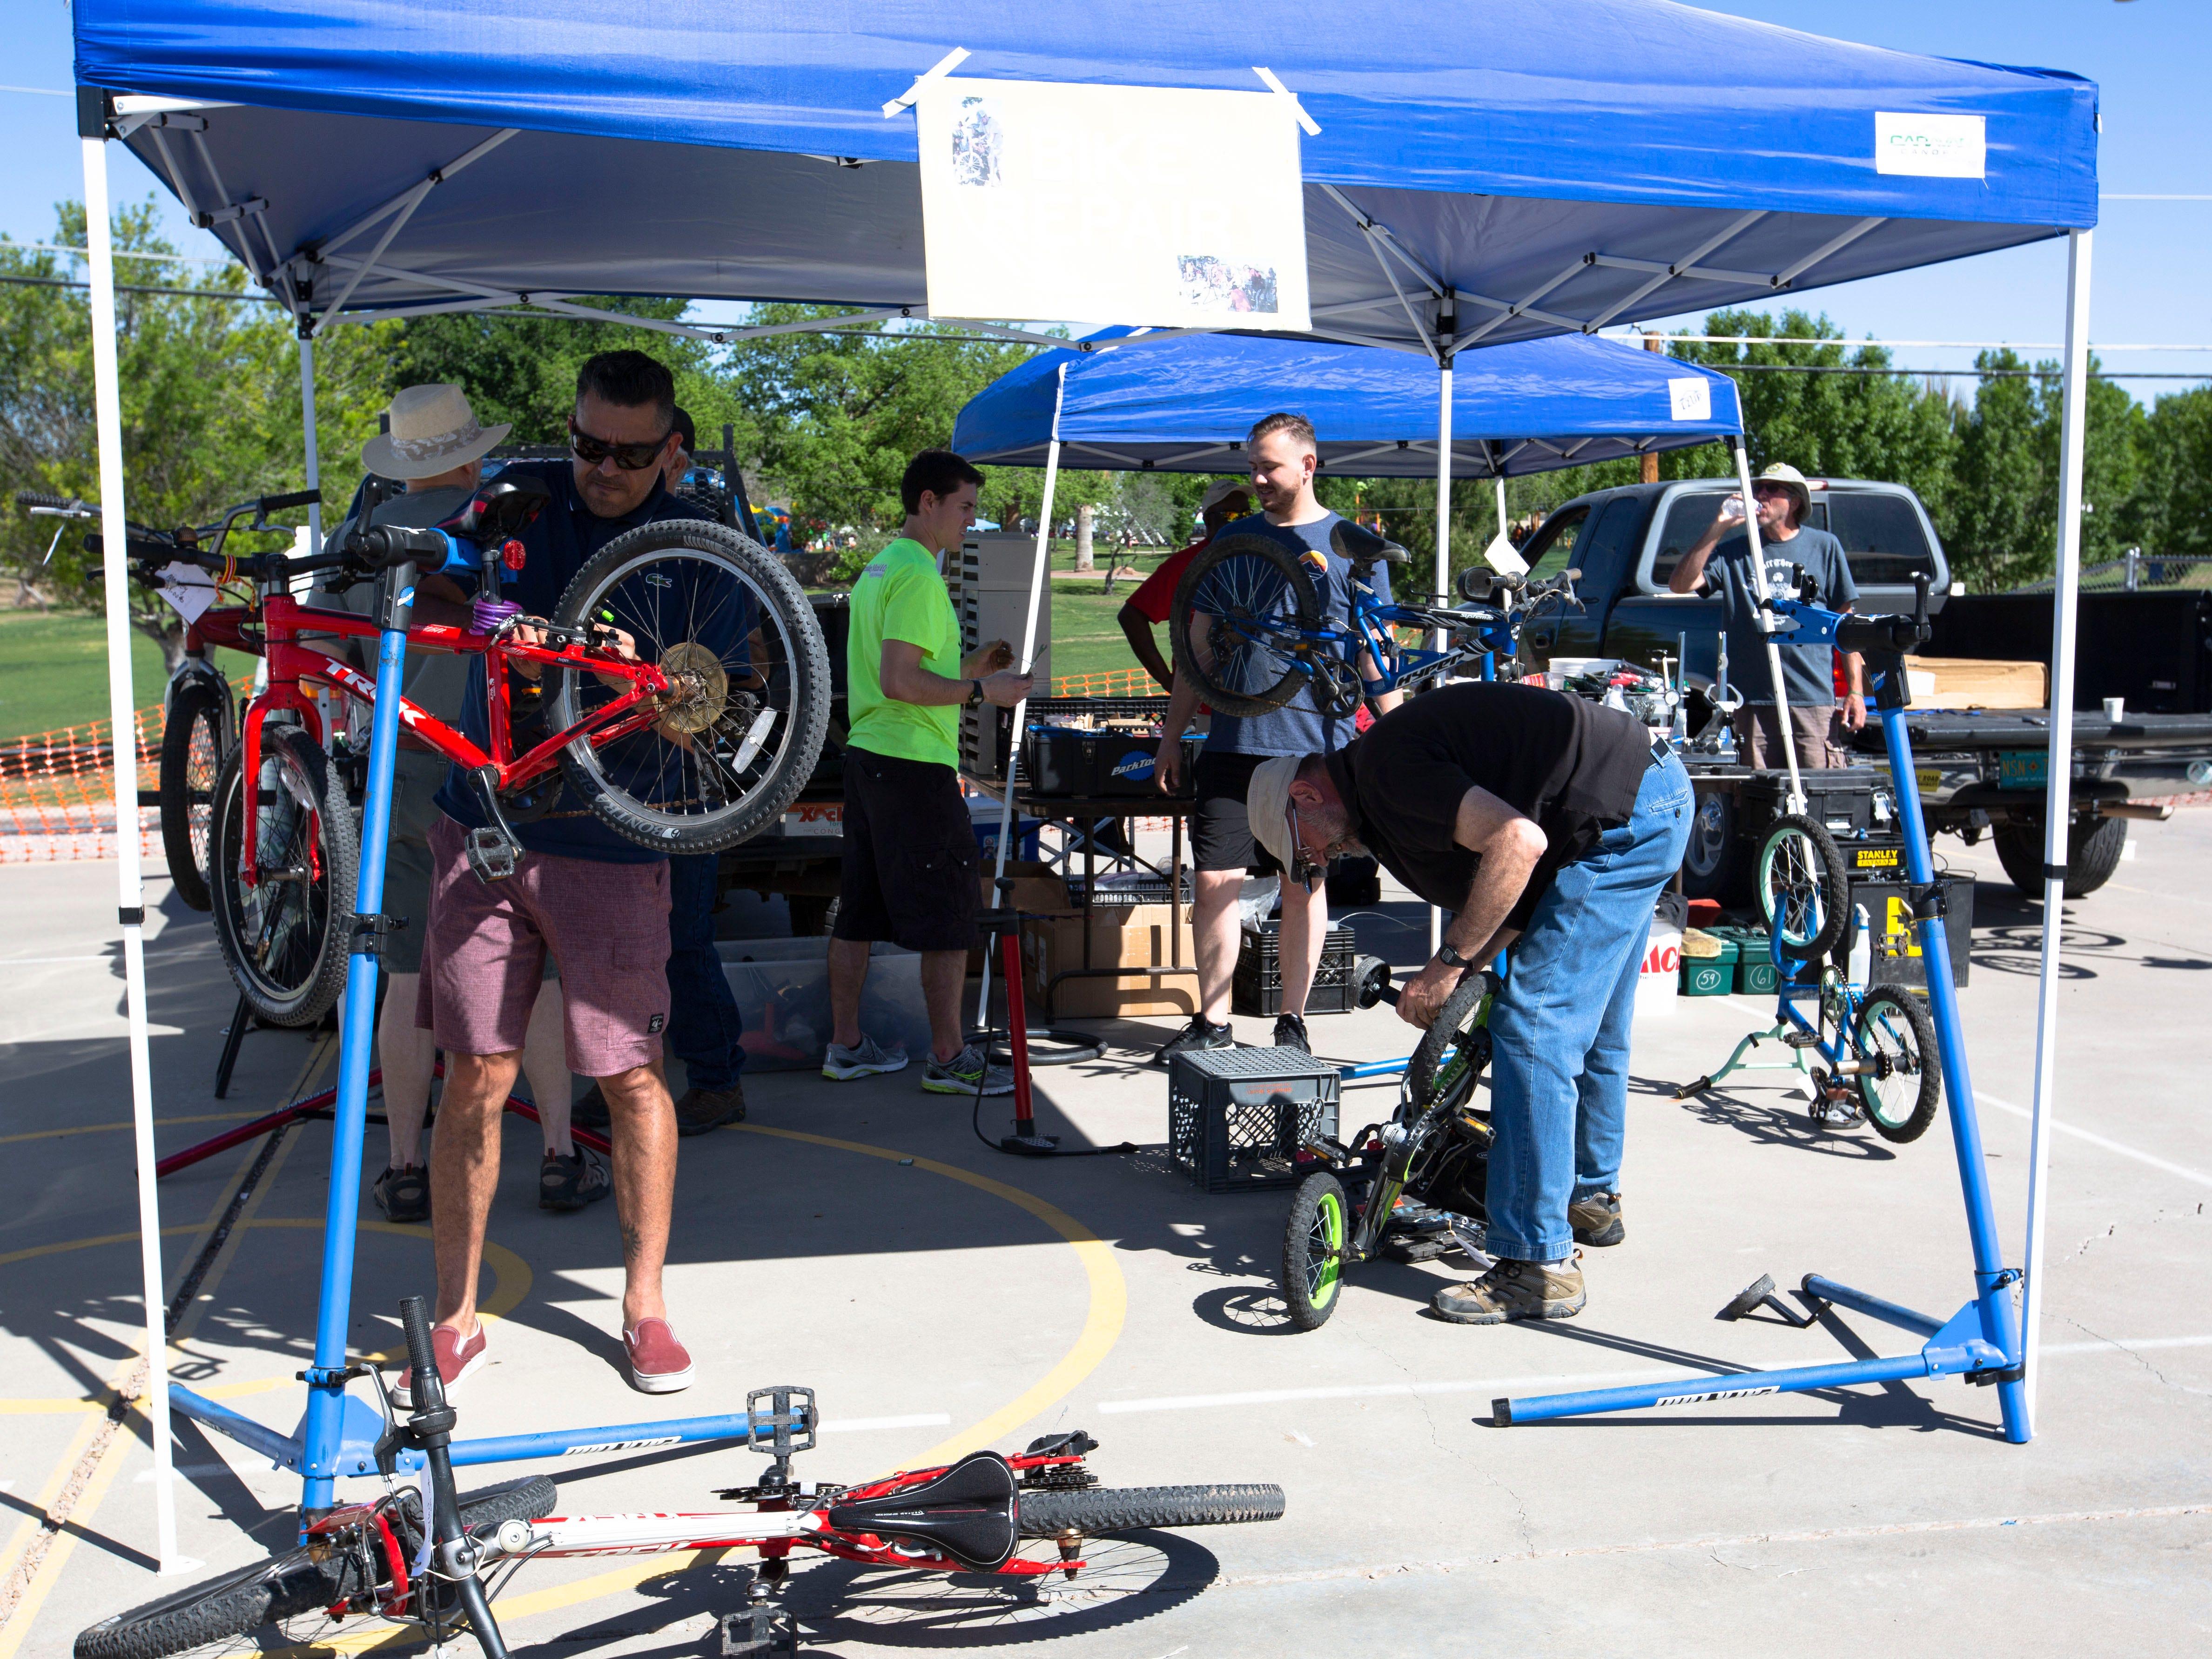 Volunteers work to repair children's bikes Saturday, April 27, 2019, at the Family Bike Fiesta at Lynn Middle School in Las Cruces.